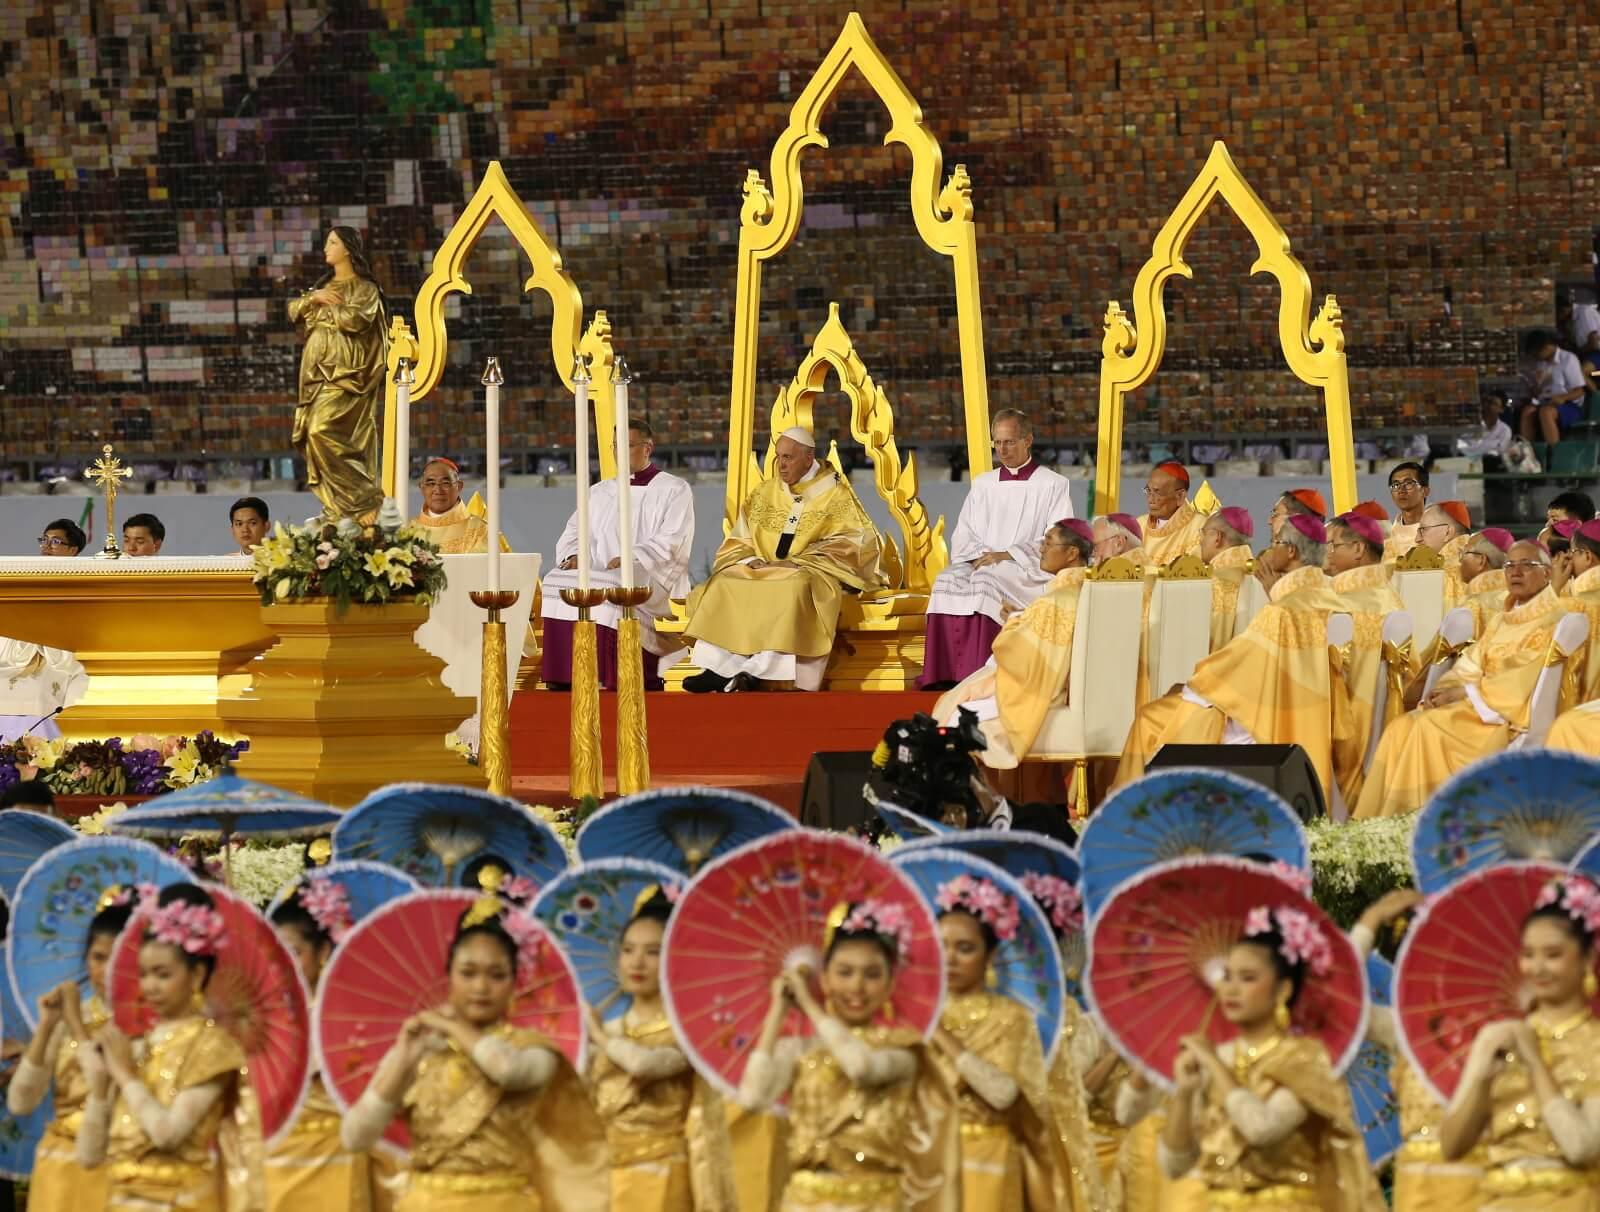 Papież Franciszek w Tajladnii fot. EPA/NARONG SANGNAK